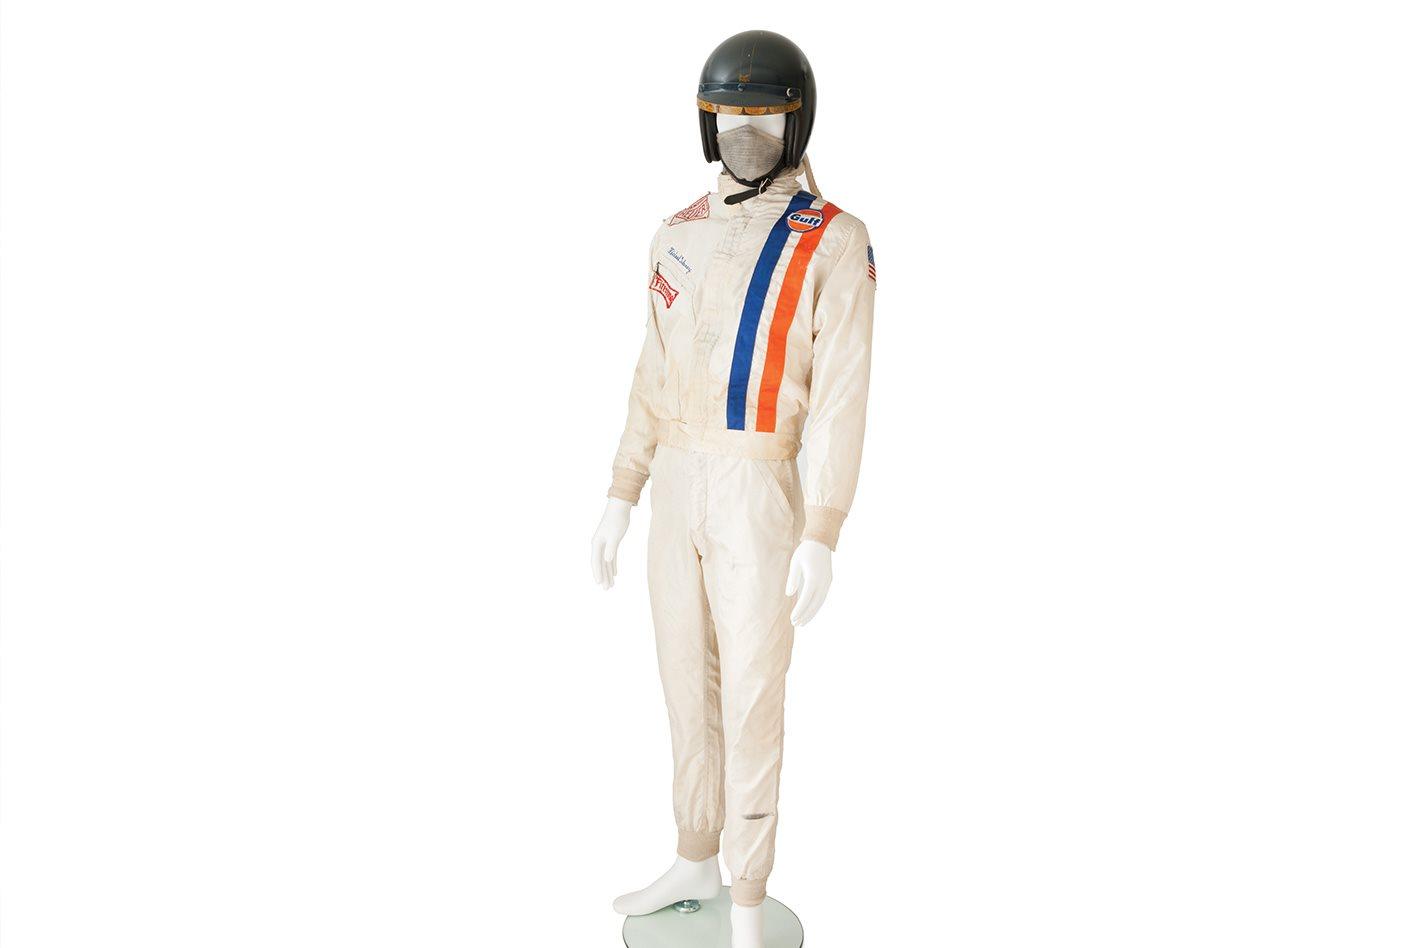 Steve-McQueen-full-racing-suit.jpg